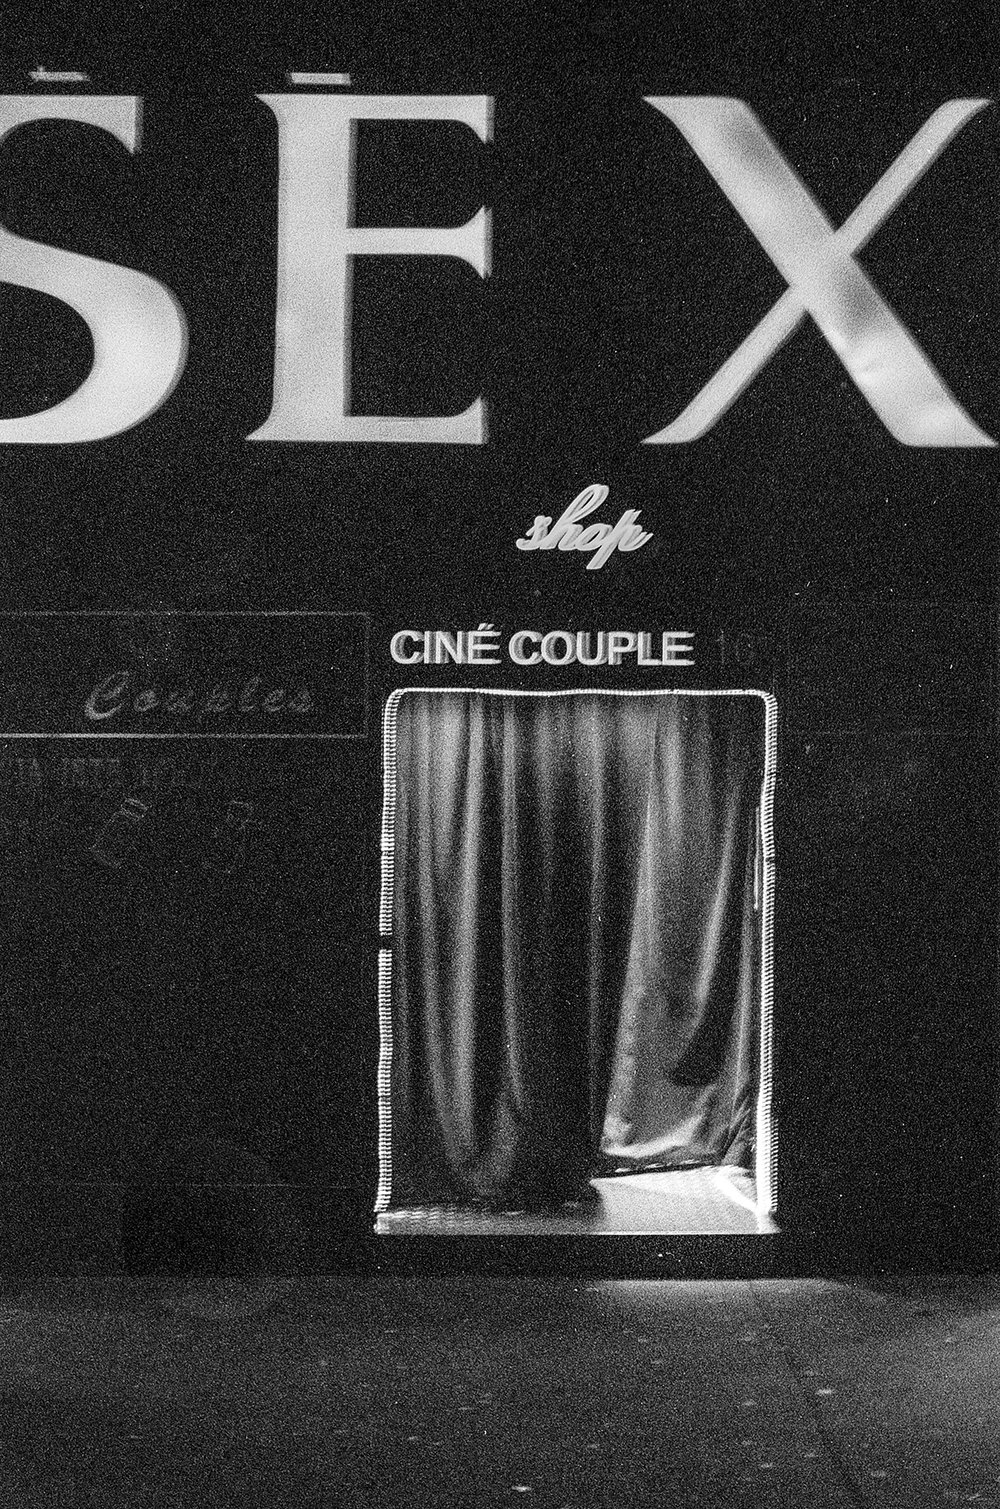 Neon City - A series dark, neon photography.Lorem ipsum dolor sit amet, consectetur adipiscing elit.